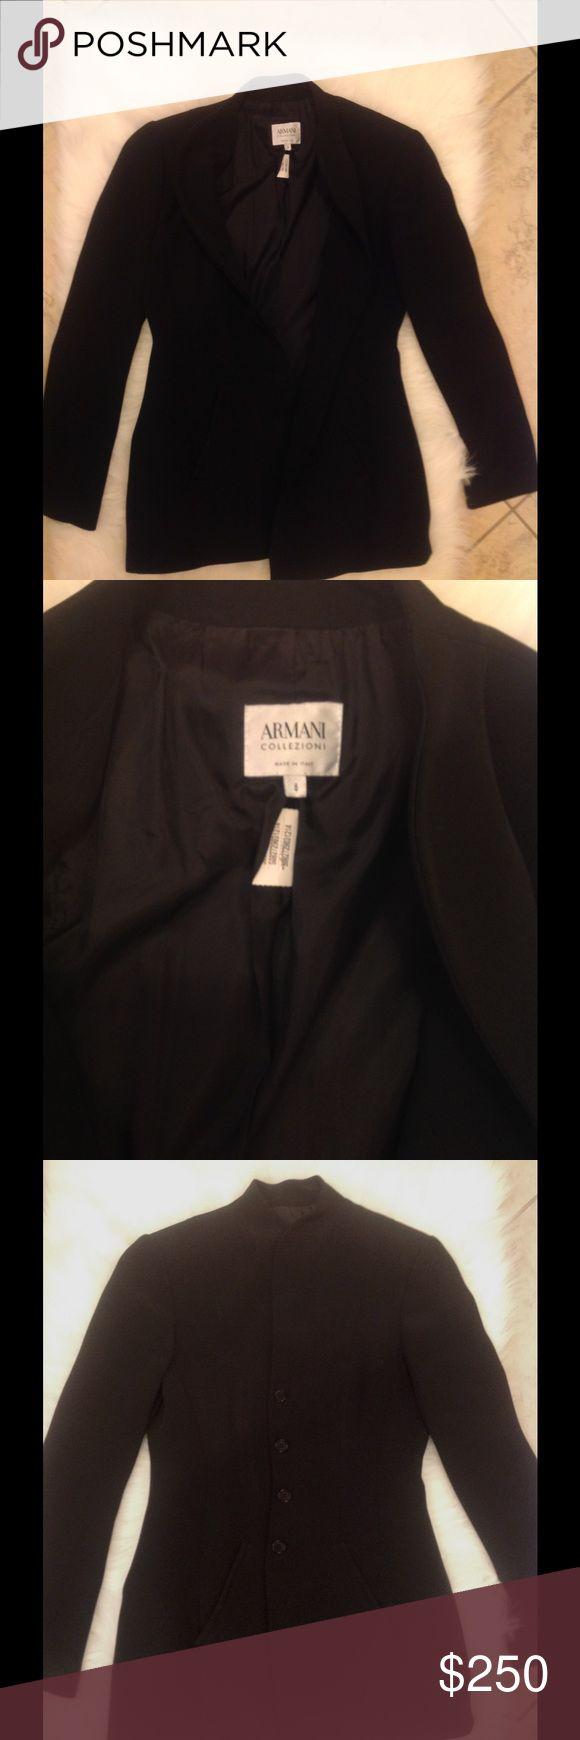 Armani Collezioni Black Suit Jacket Armani Collezioni Black Suit Jacket size 6, fully lined. Armani Collezioni Jackets & Coats Blazers